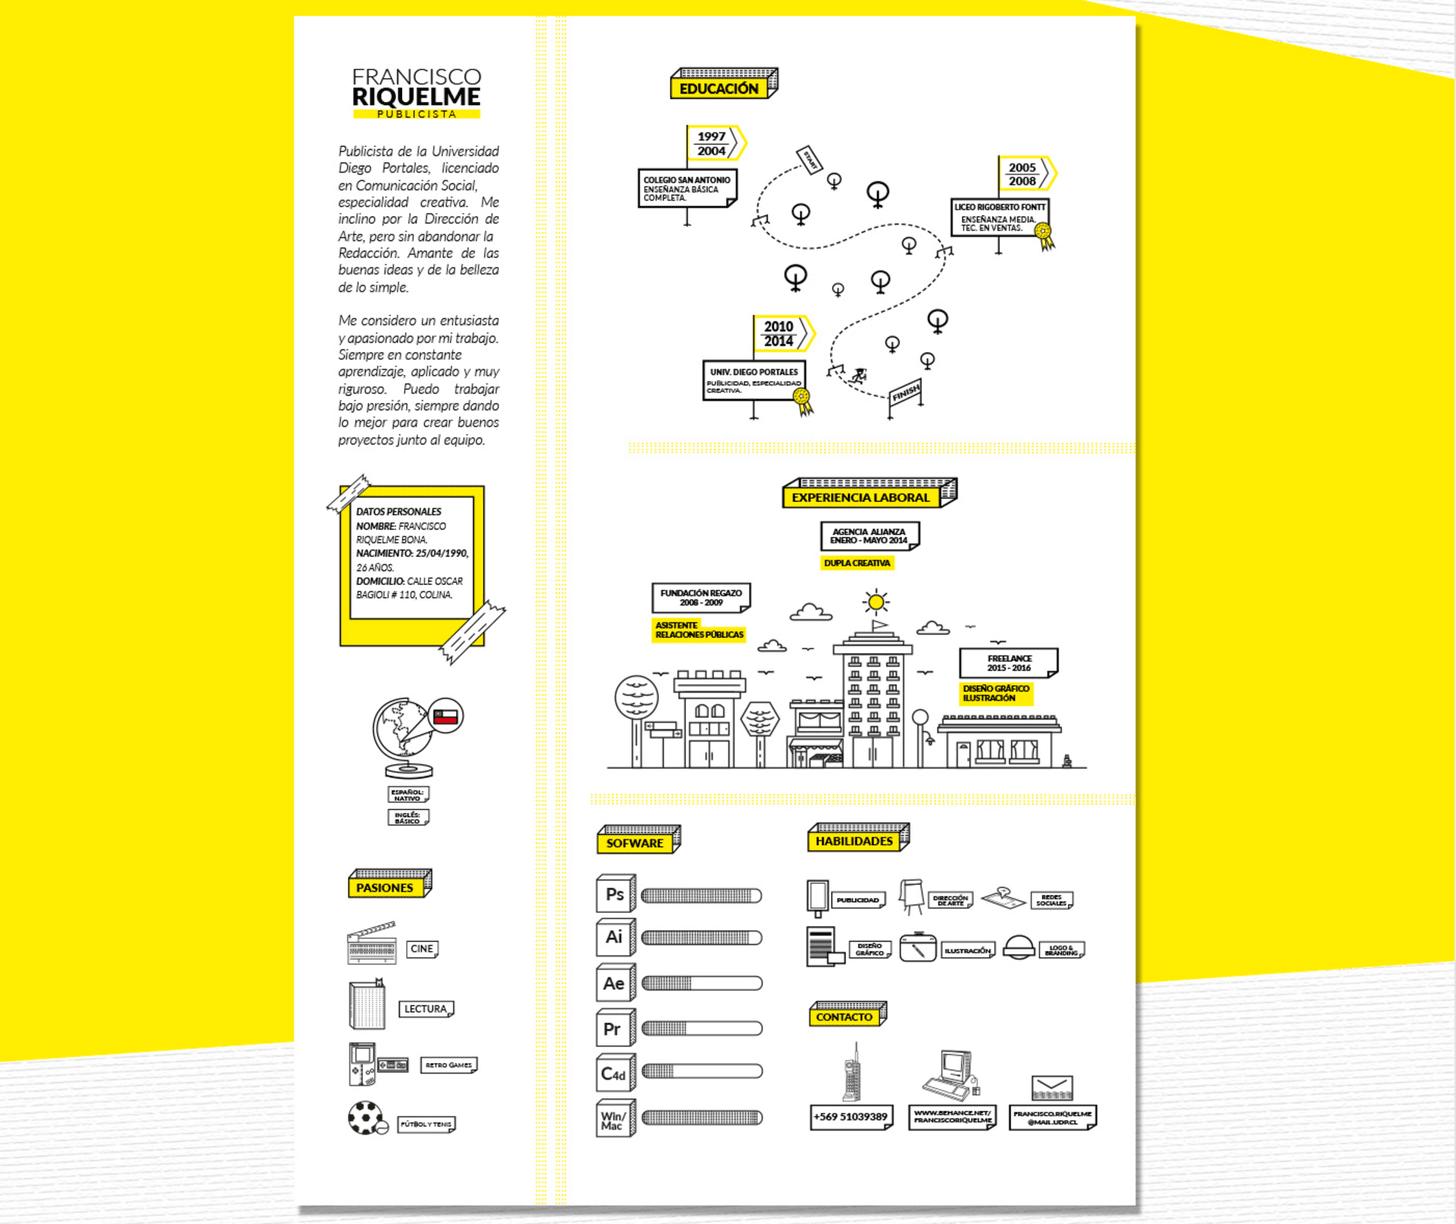 image23 Resume design, Infographic resume, Resume